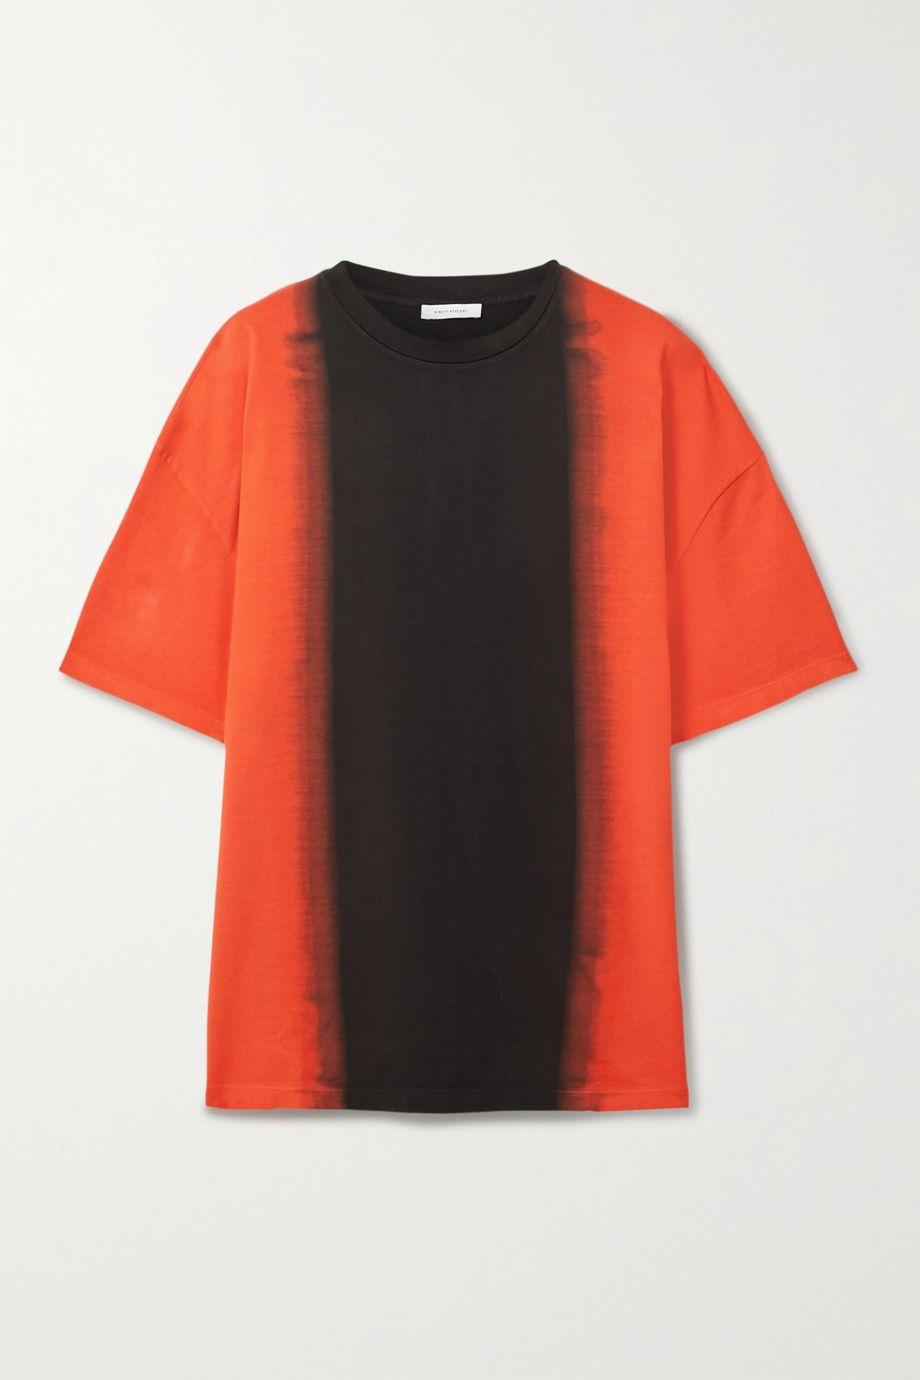 Ninety Percent Oversized dégradé organic cotton-jersey T-shirt